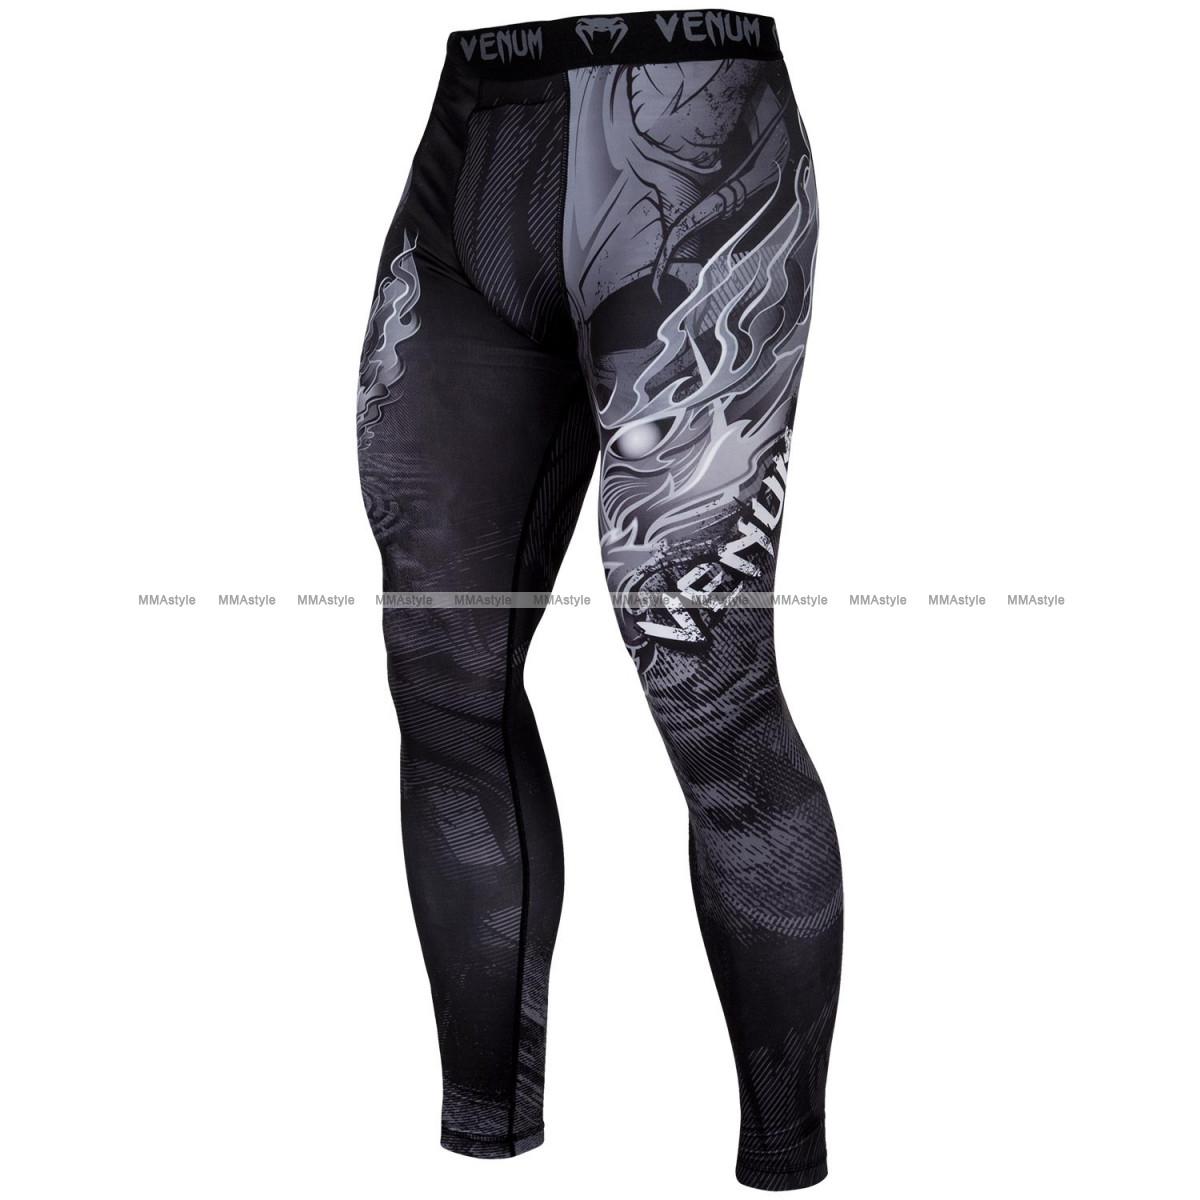 Компрессионные штаны Venum Minotaurus Spats Black